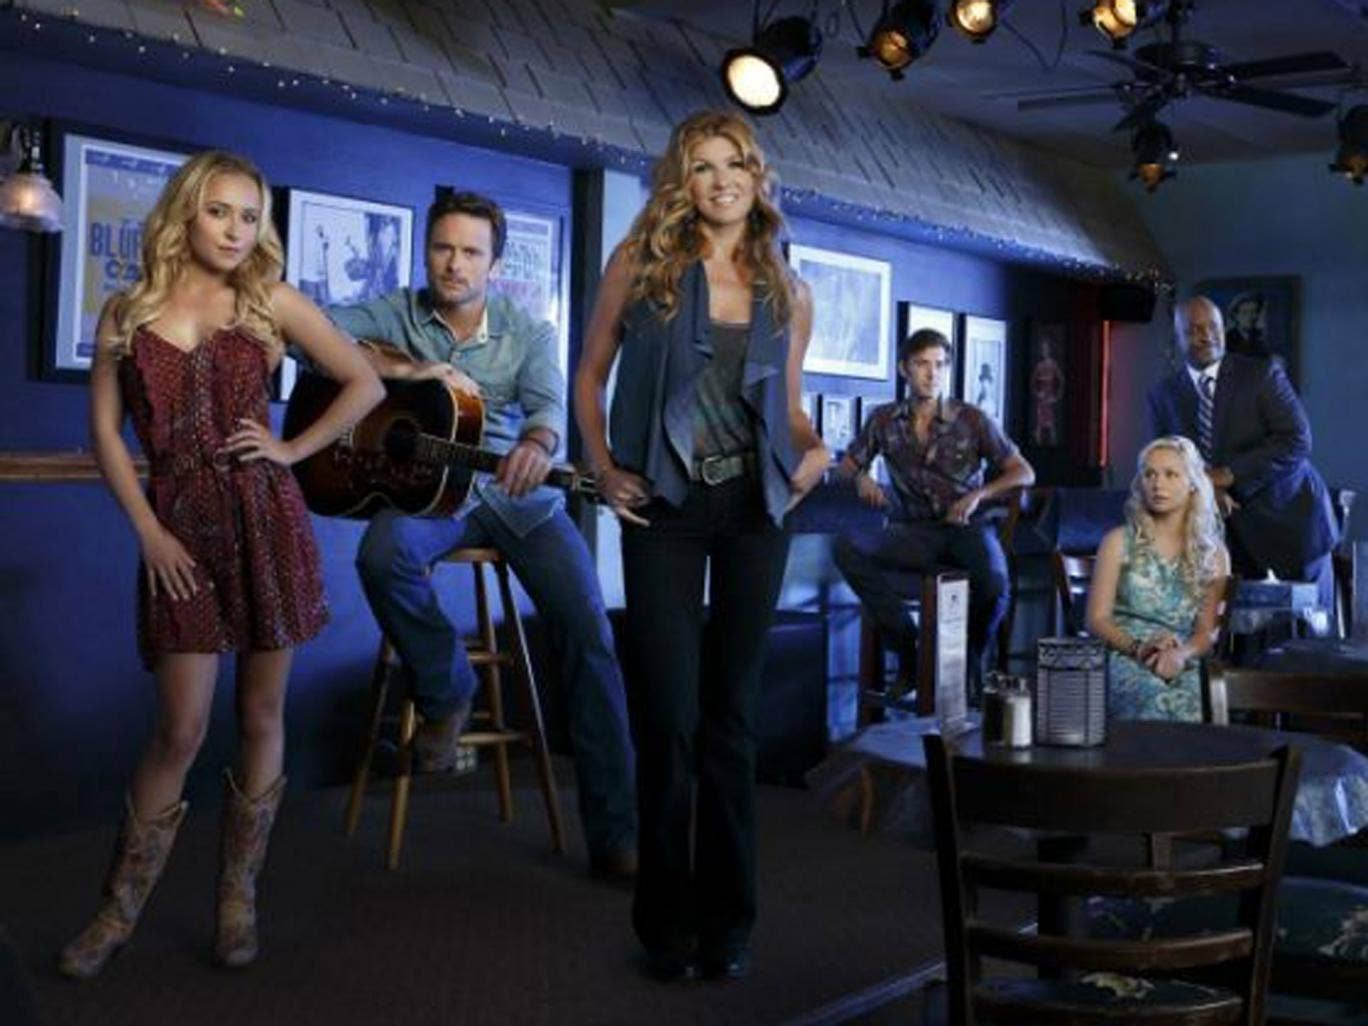 'Nashville' starts on 7 February at 10pm on More 4